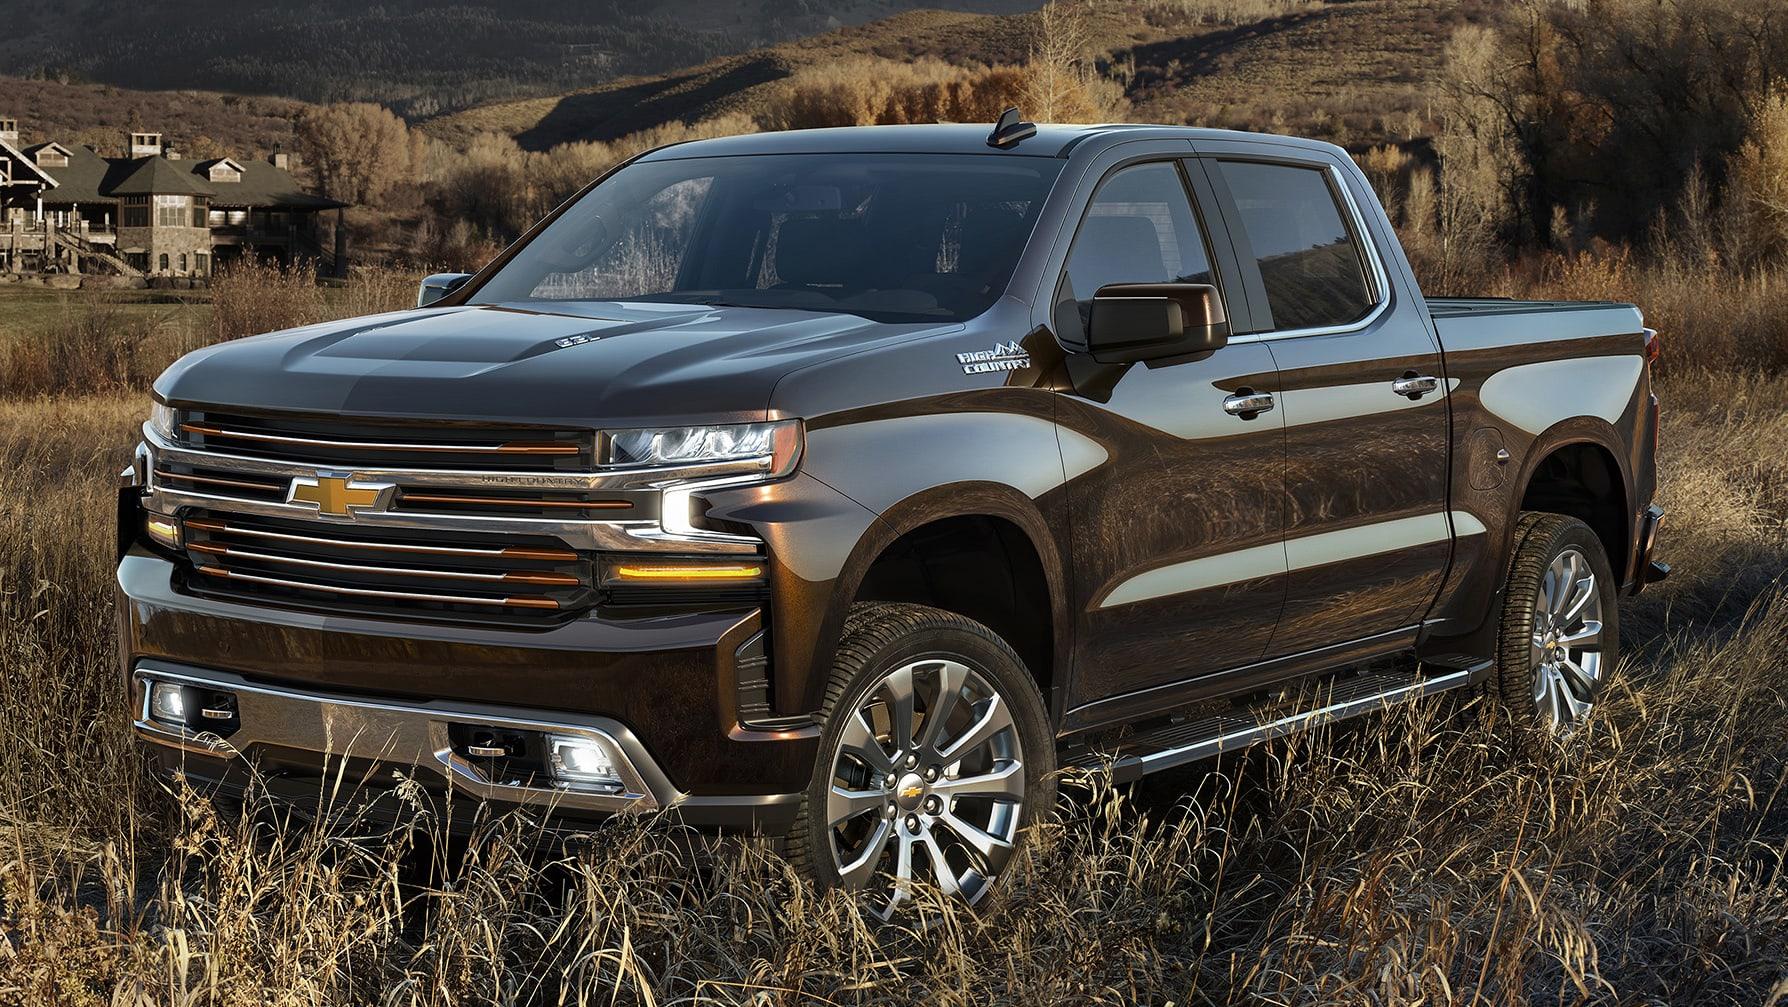 Chevrolet Tahoe High Country and next-generation Cadillac Escalade spy photos | Autoblog